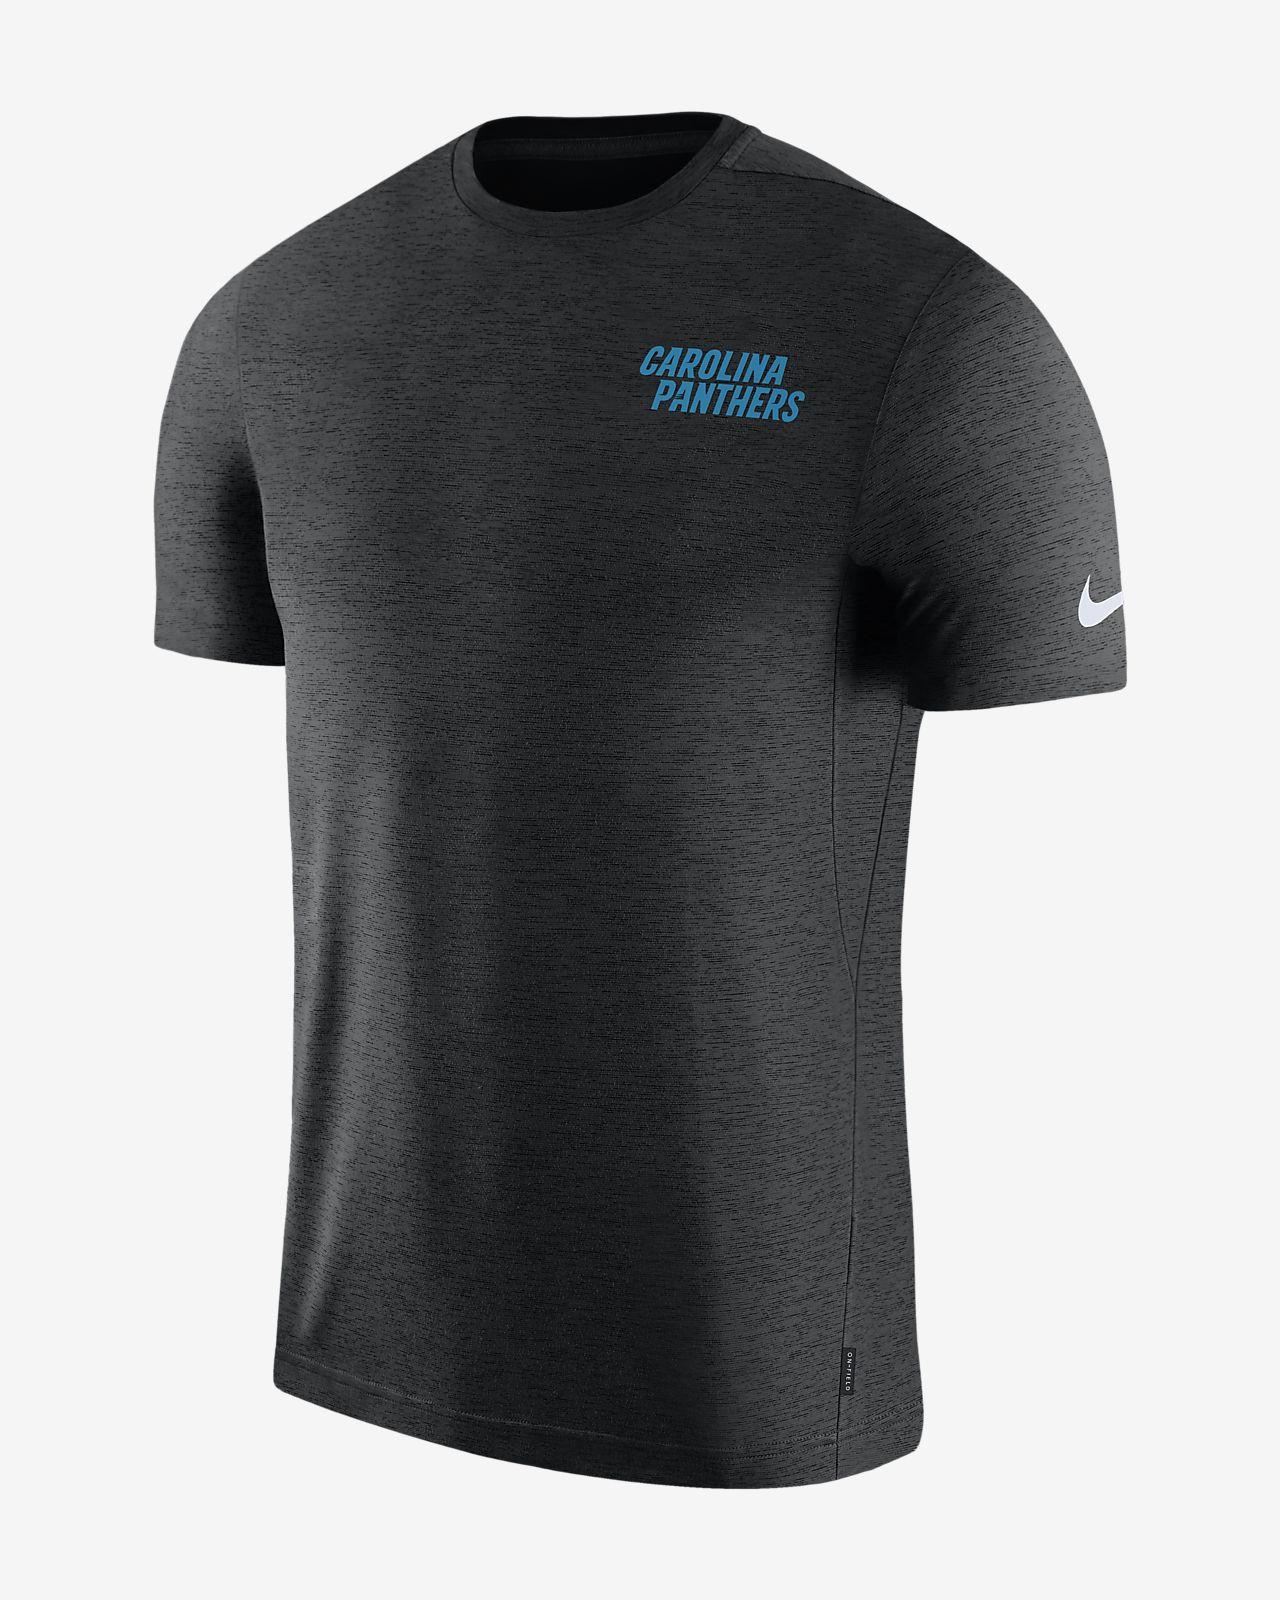 3d1861378 Nike Dri-FIT Coach (NFL Panthers) Men's Short-Sleeve Top. Nike.com